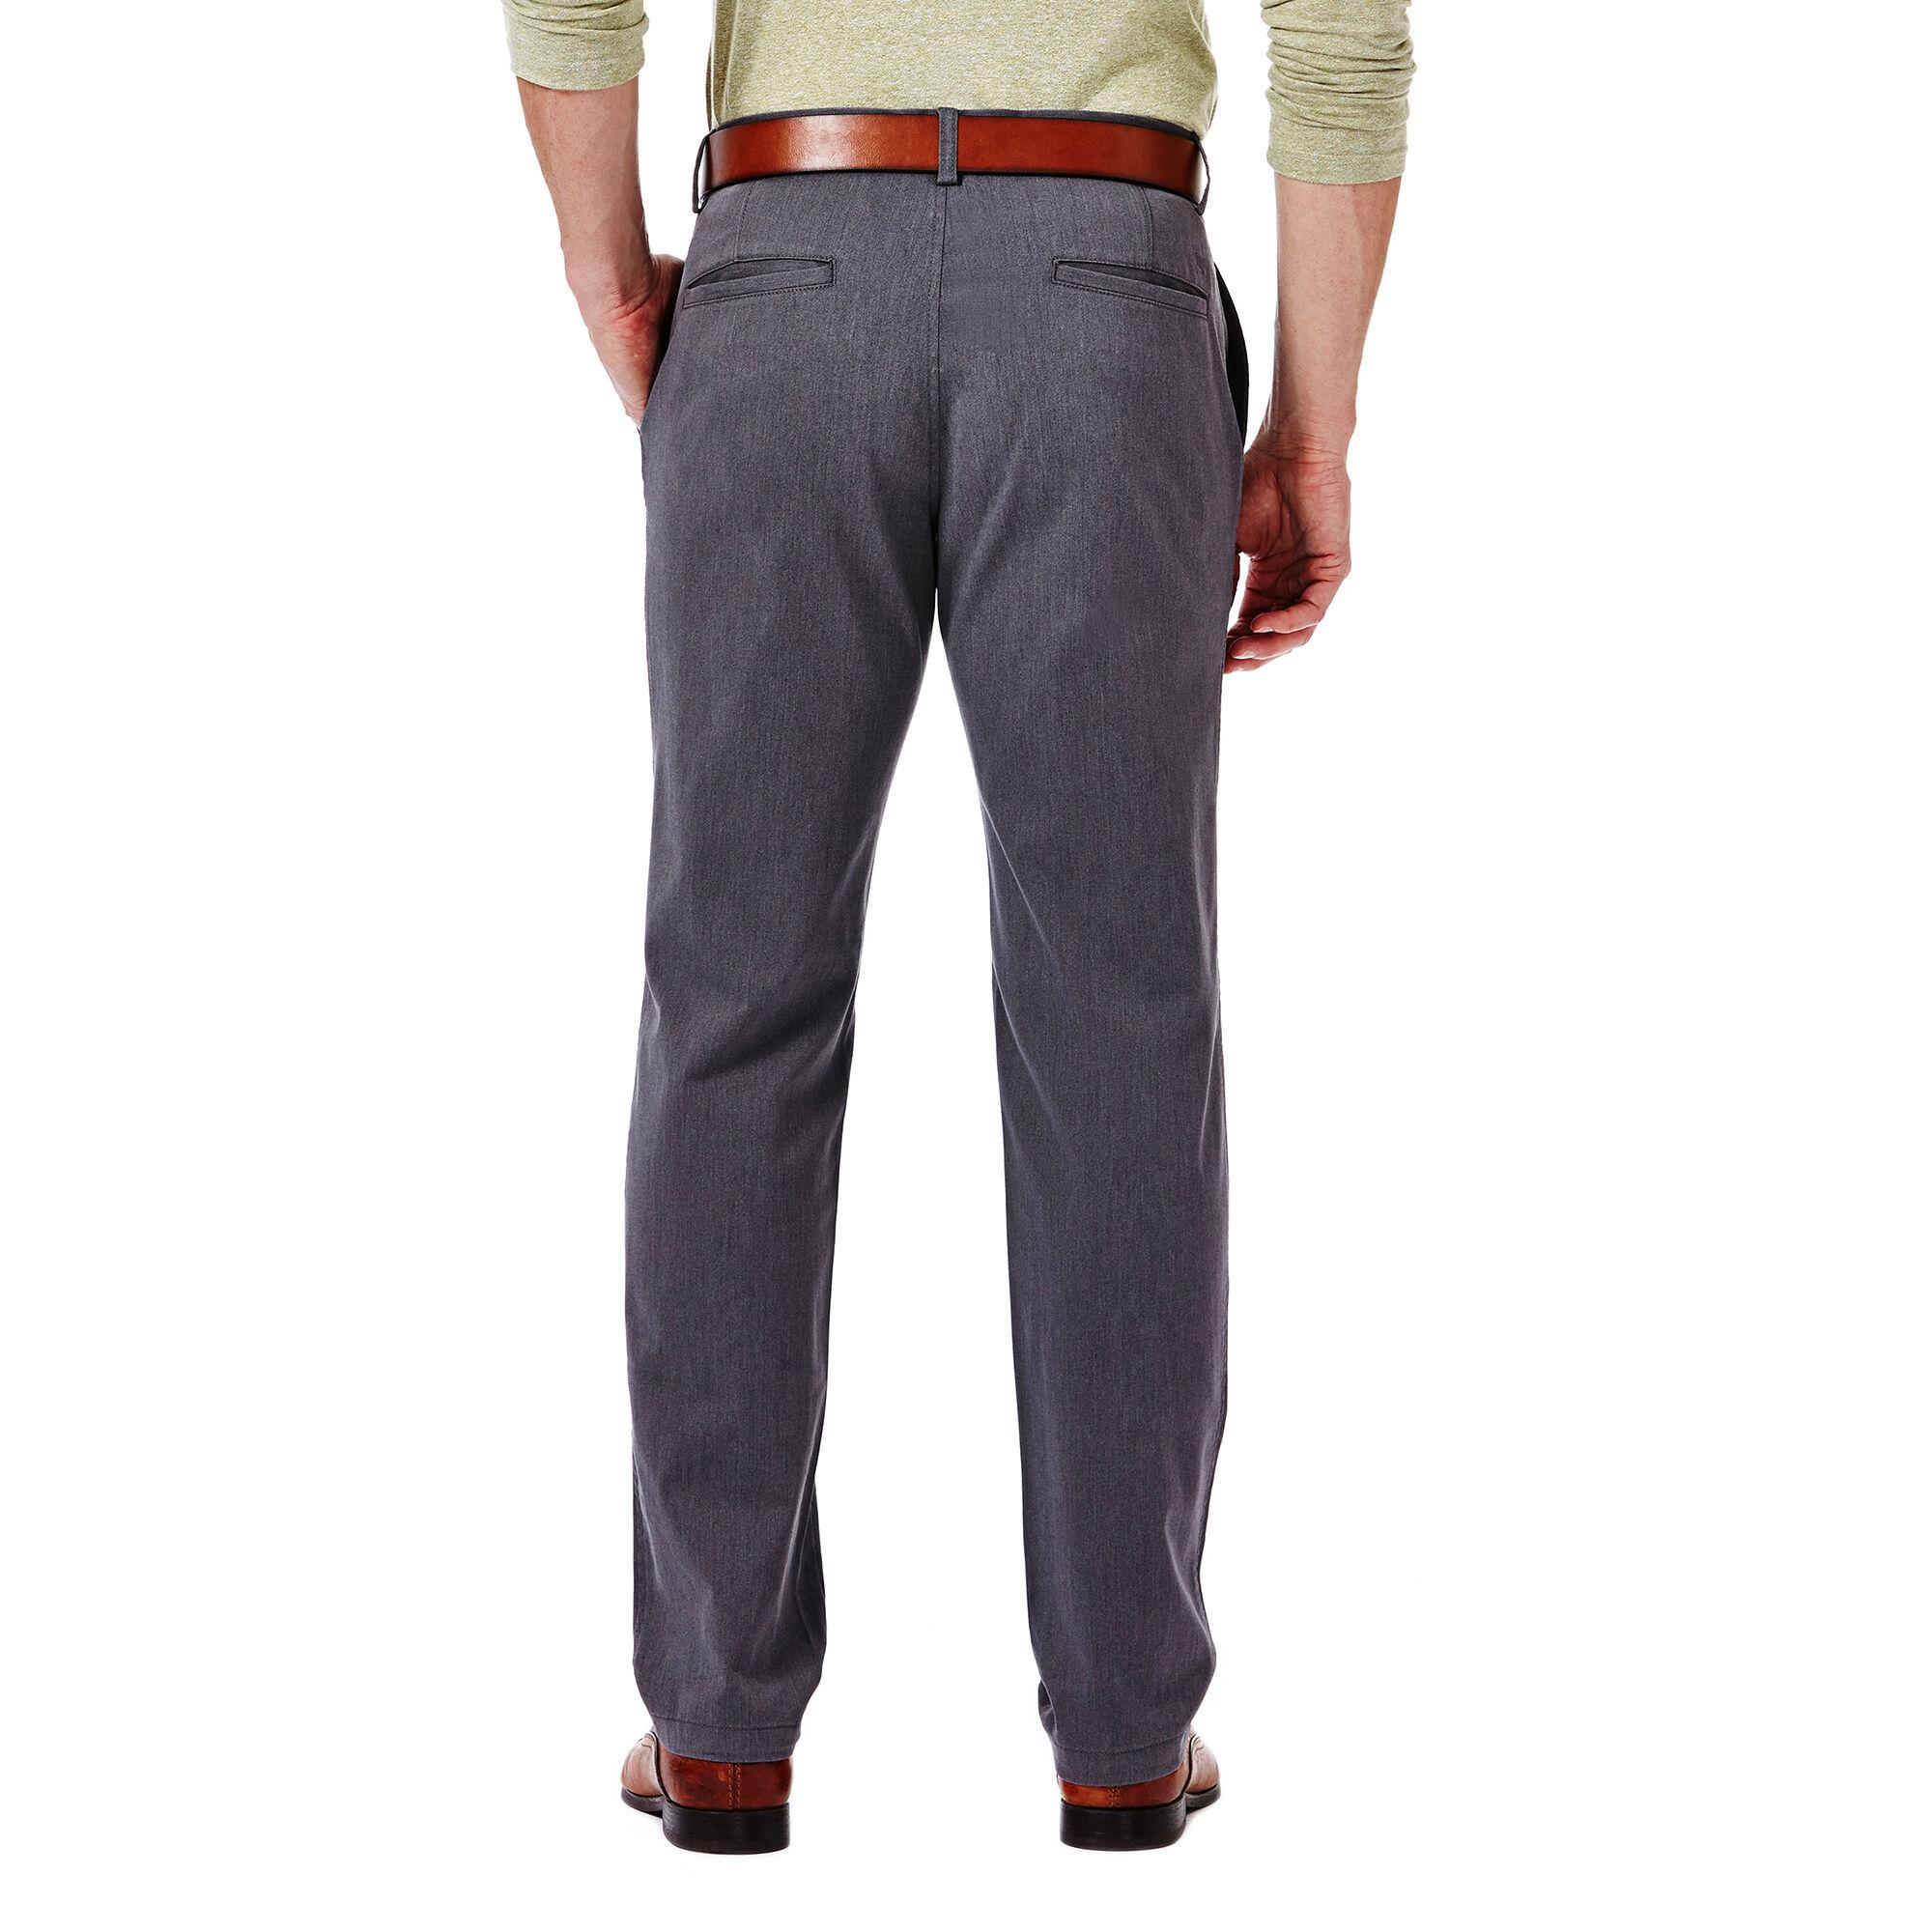 "NWT Men/'s Haggar Premium Stretch Dress Pants w//3/"" Flex Waistband-Variety"